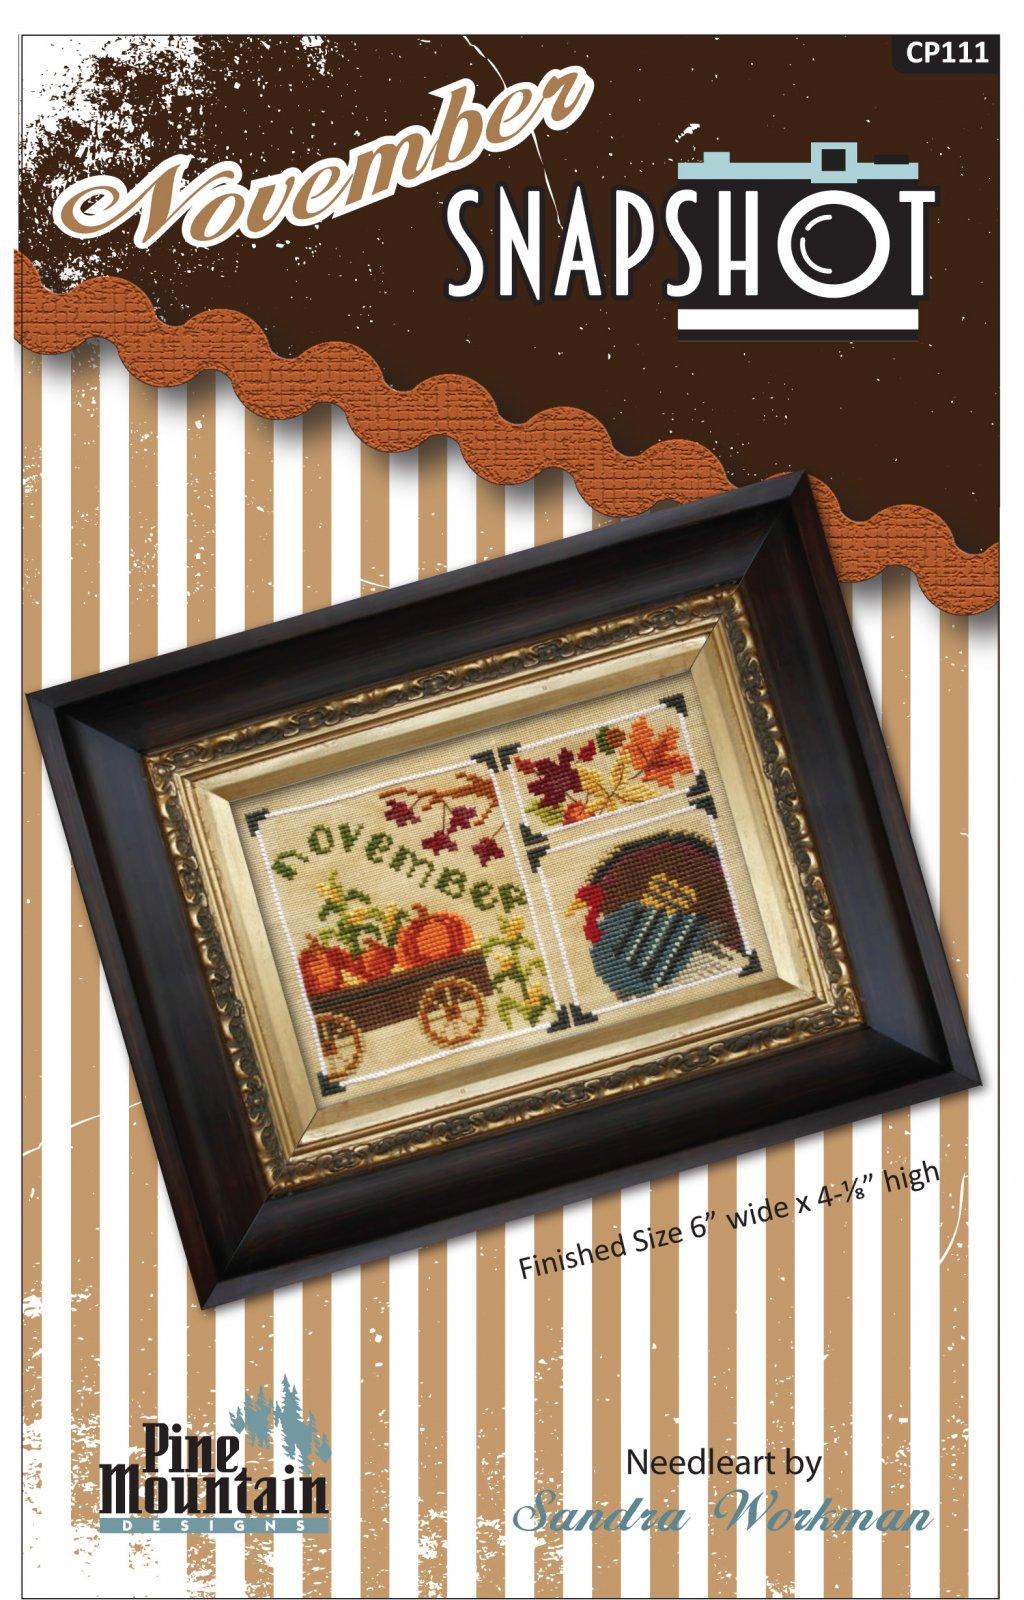 November Snapshot cross stitch pattern CP111